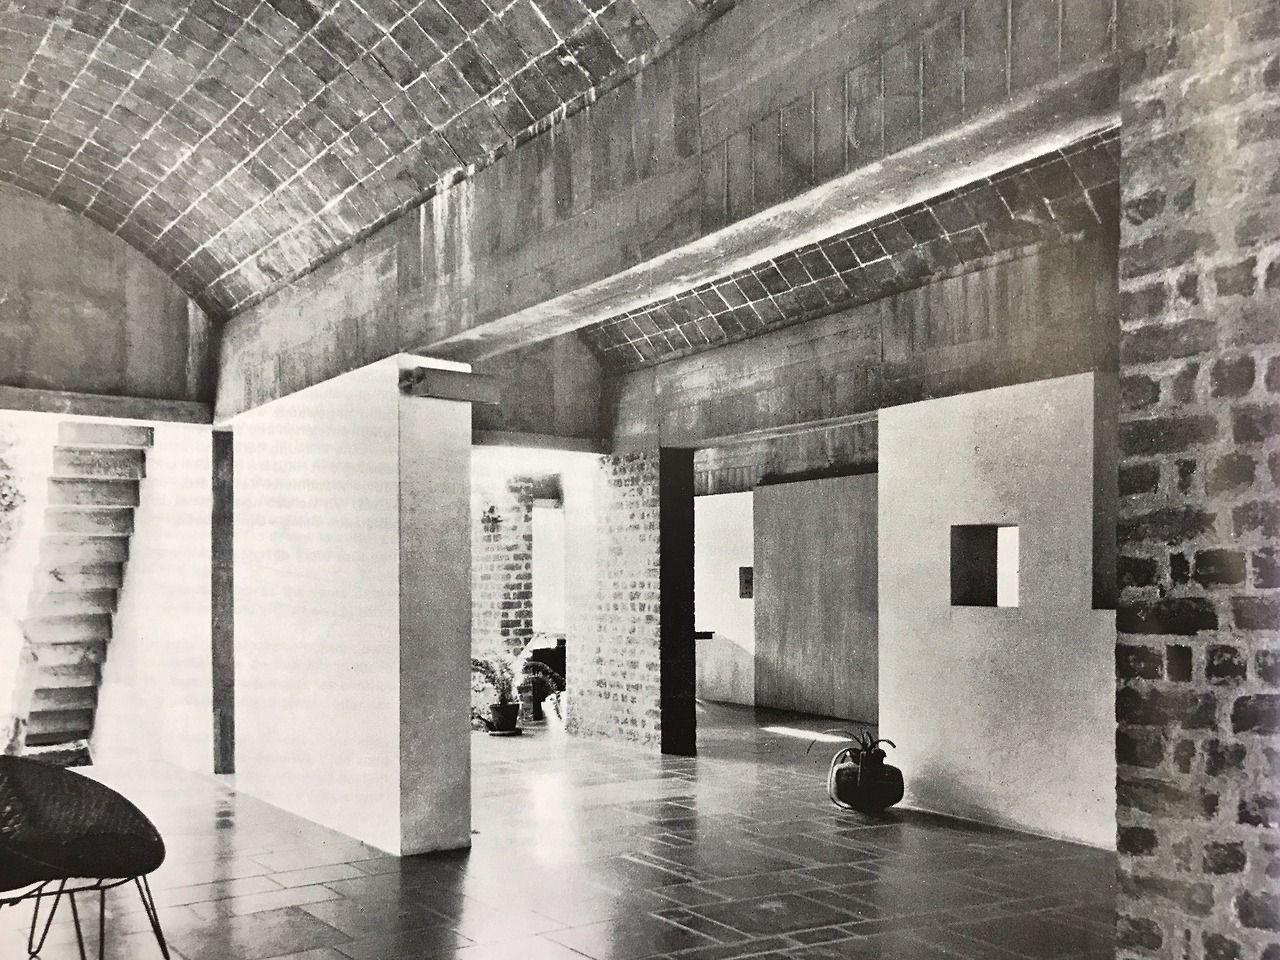 Le Corbusier S Villa Sarabhai Ahmedabad 1955 Via Here Le